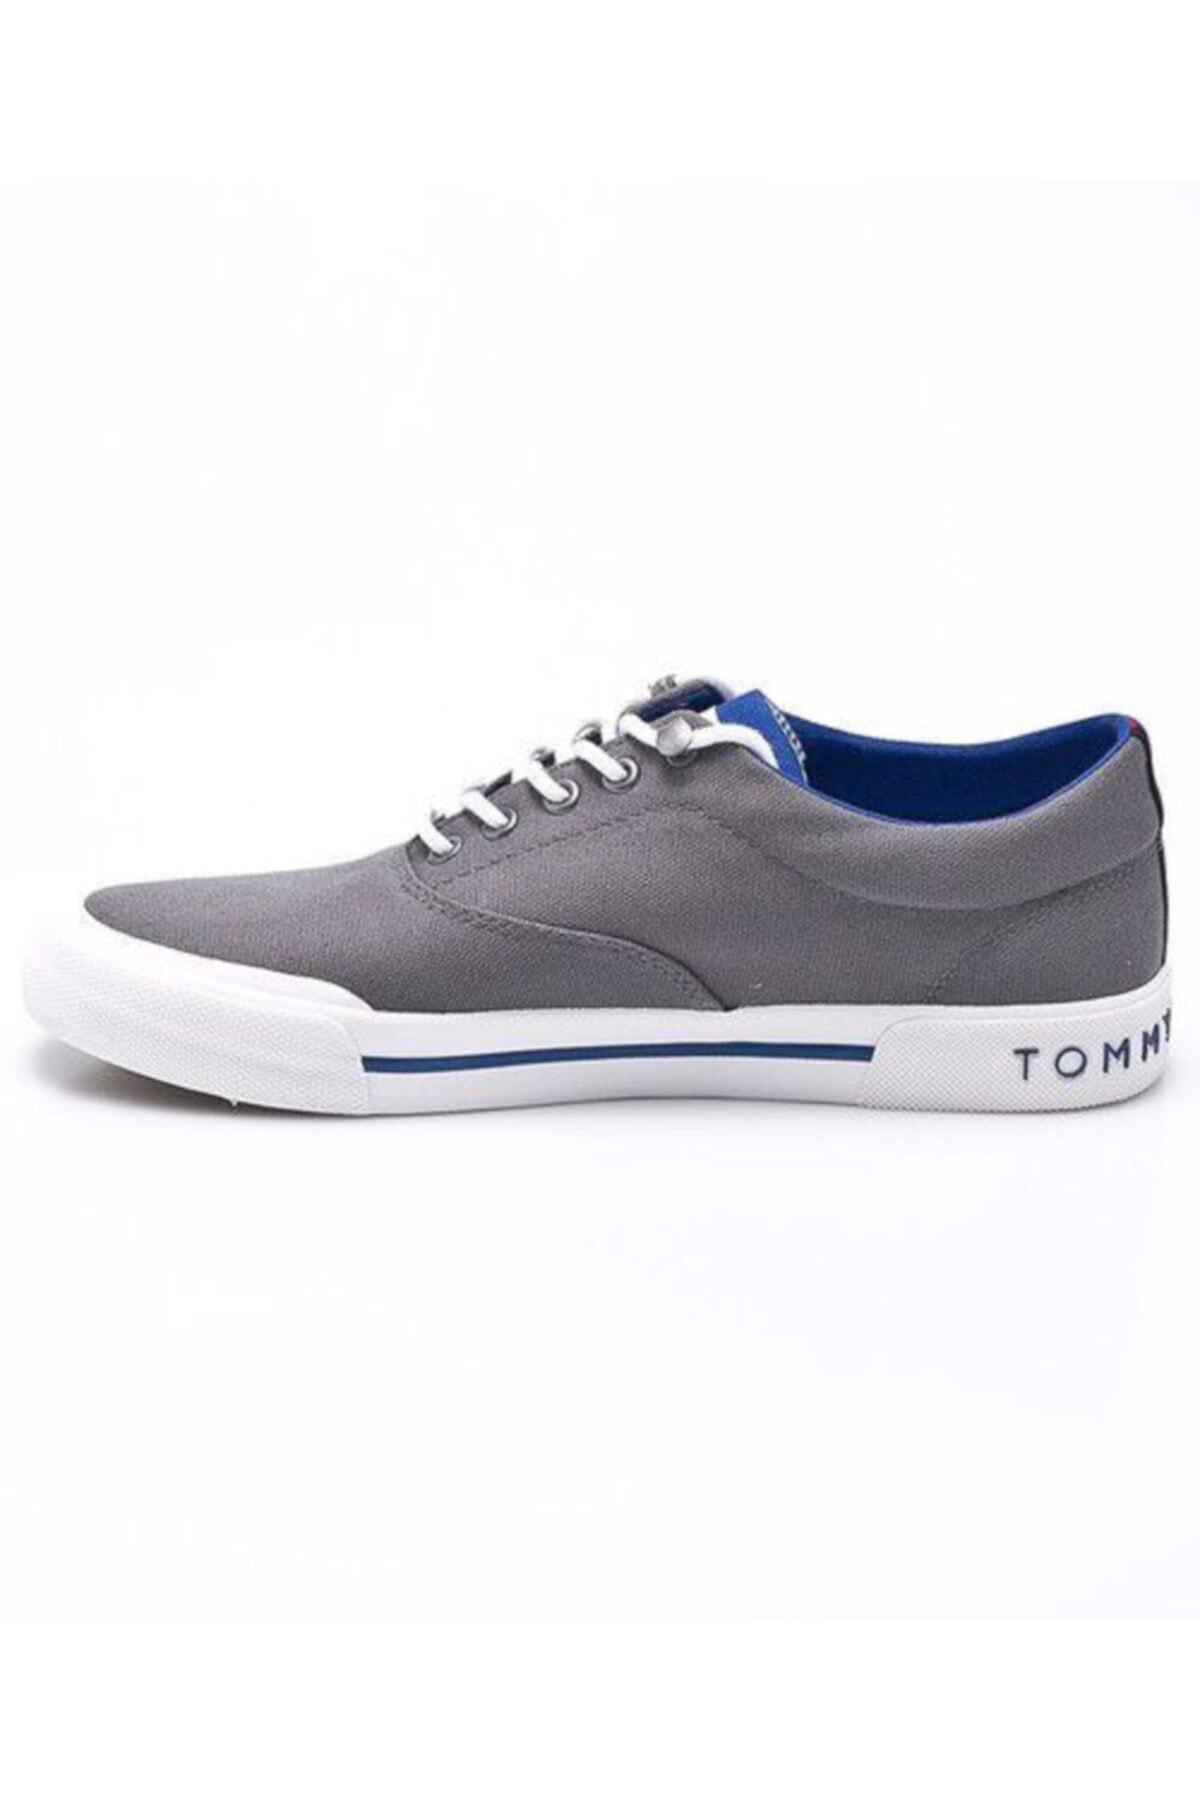 Tommy Hilfiger Herıtage Textıle Sneaker 2